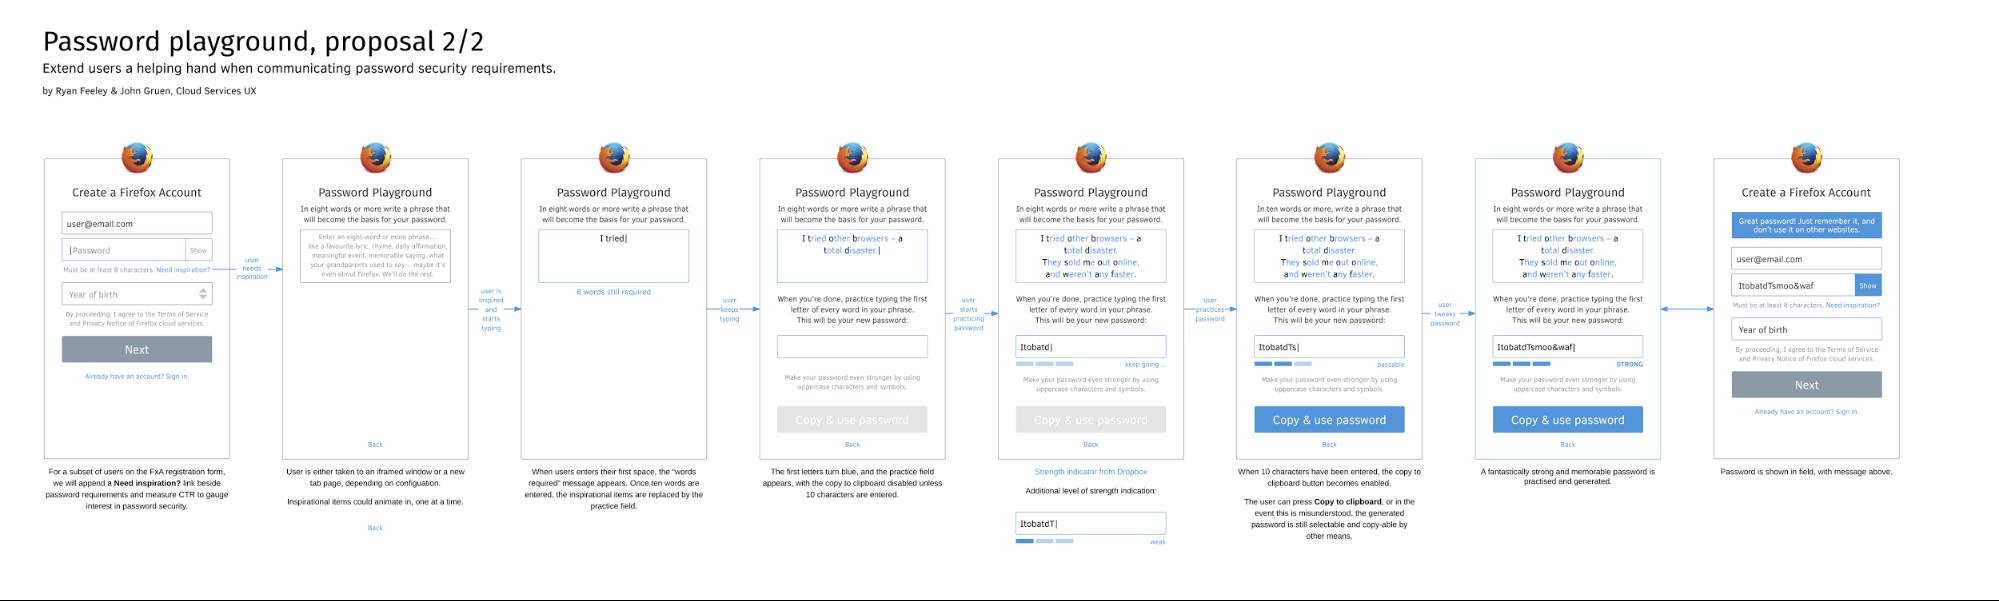 Mozilla Firefox mockup design example